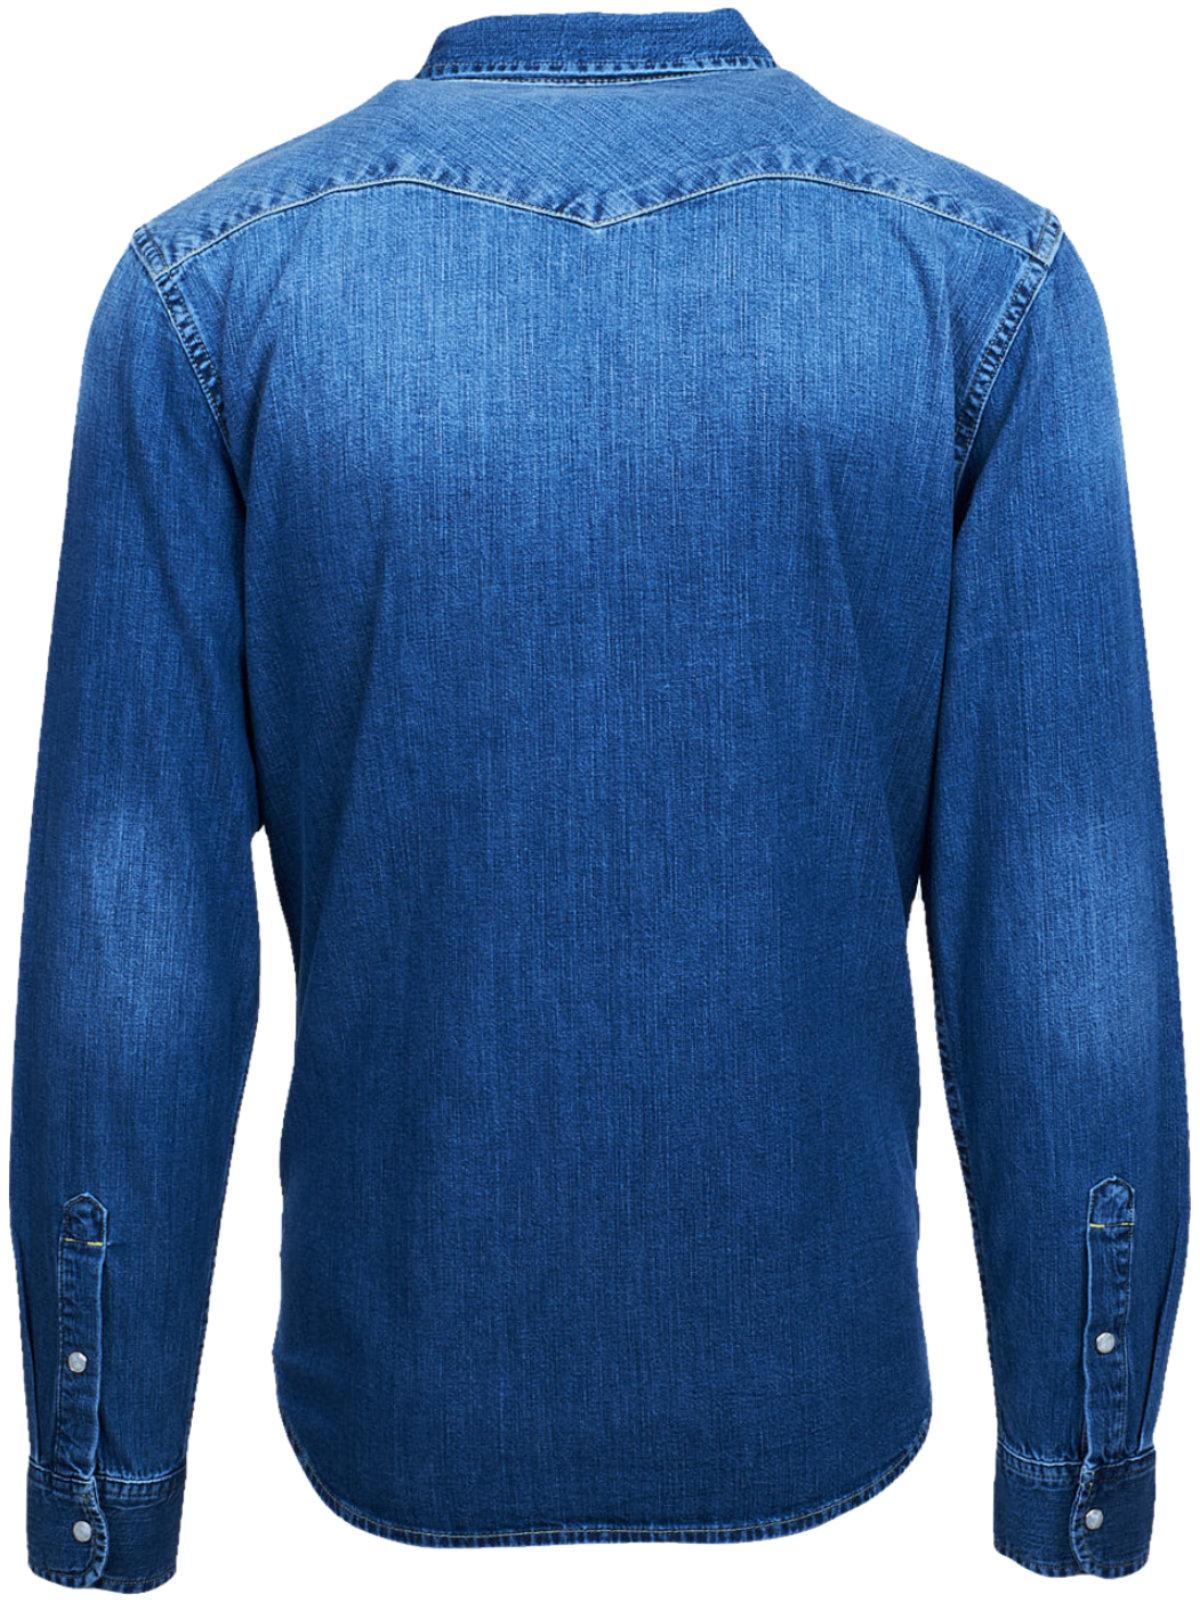 lee slim jeanshemd westernshirt herren hemd arbeits neu. Black Bedroom Furniture Sets. Home Design Ideas